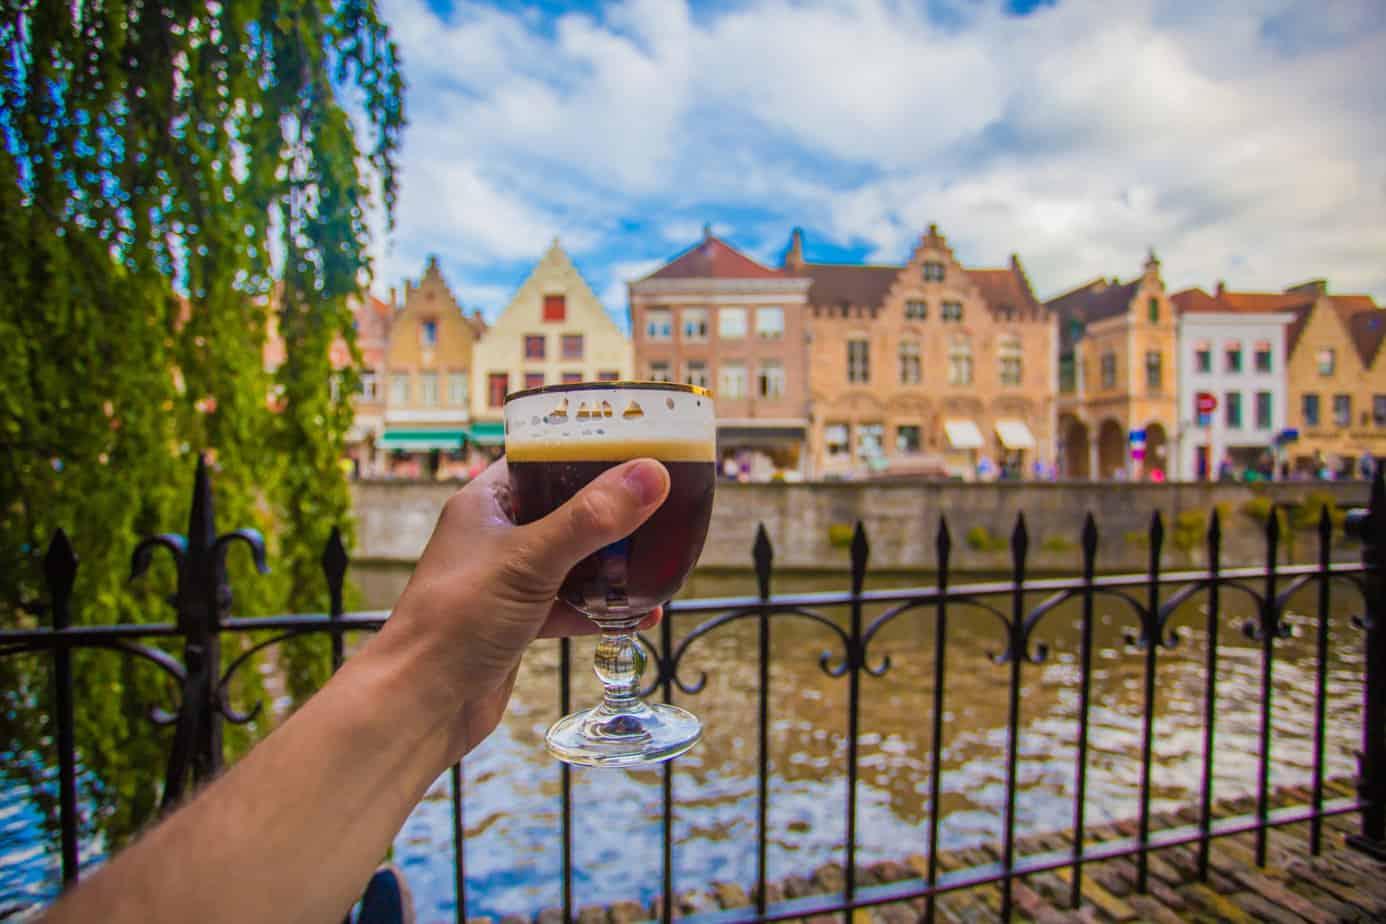 Bier in Brugge